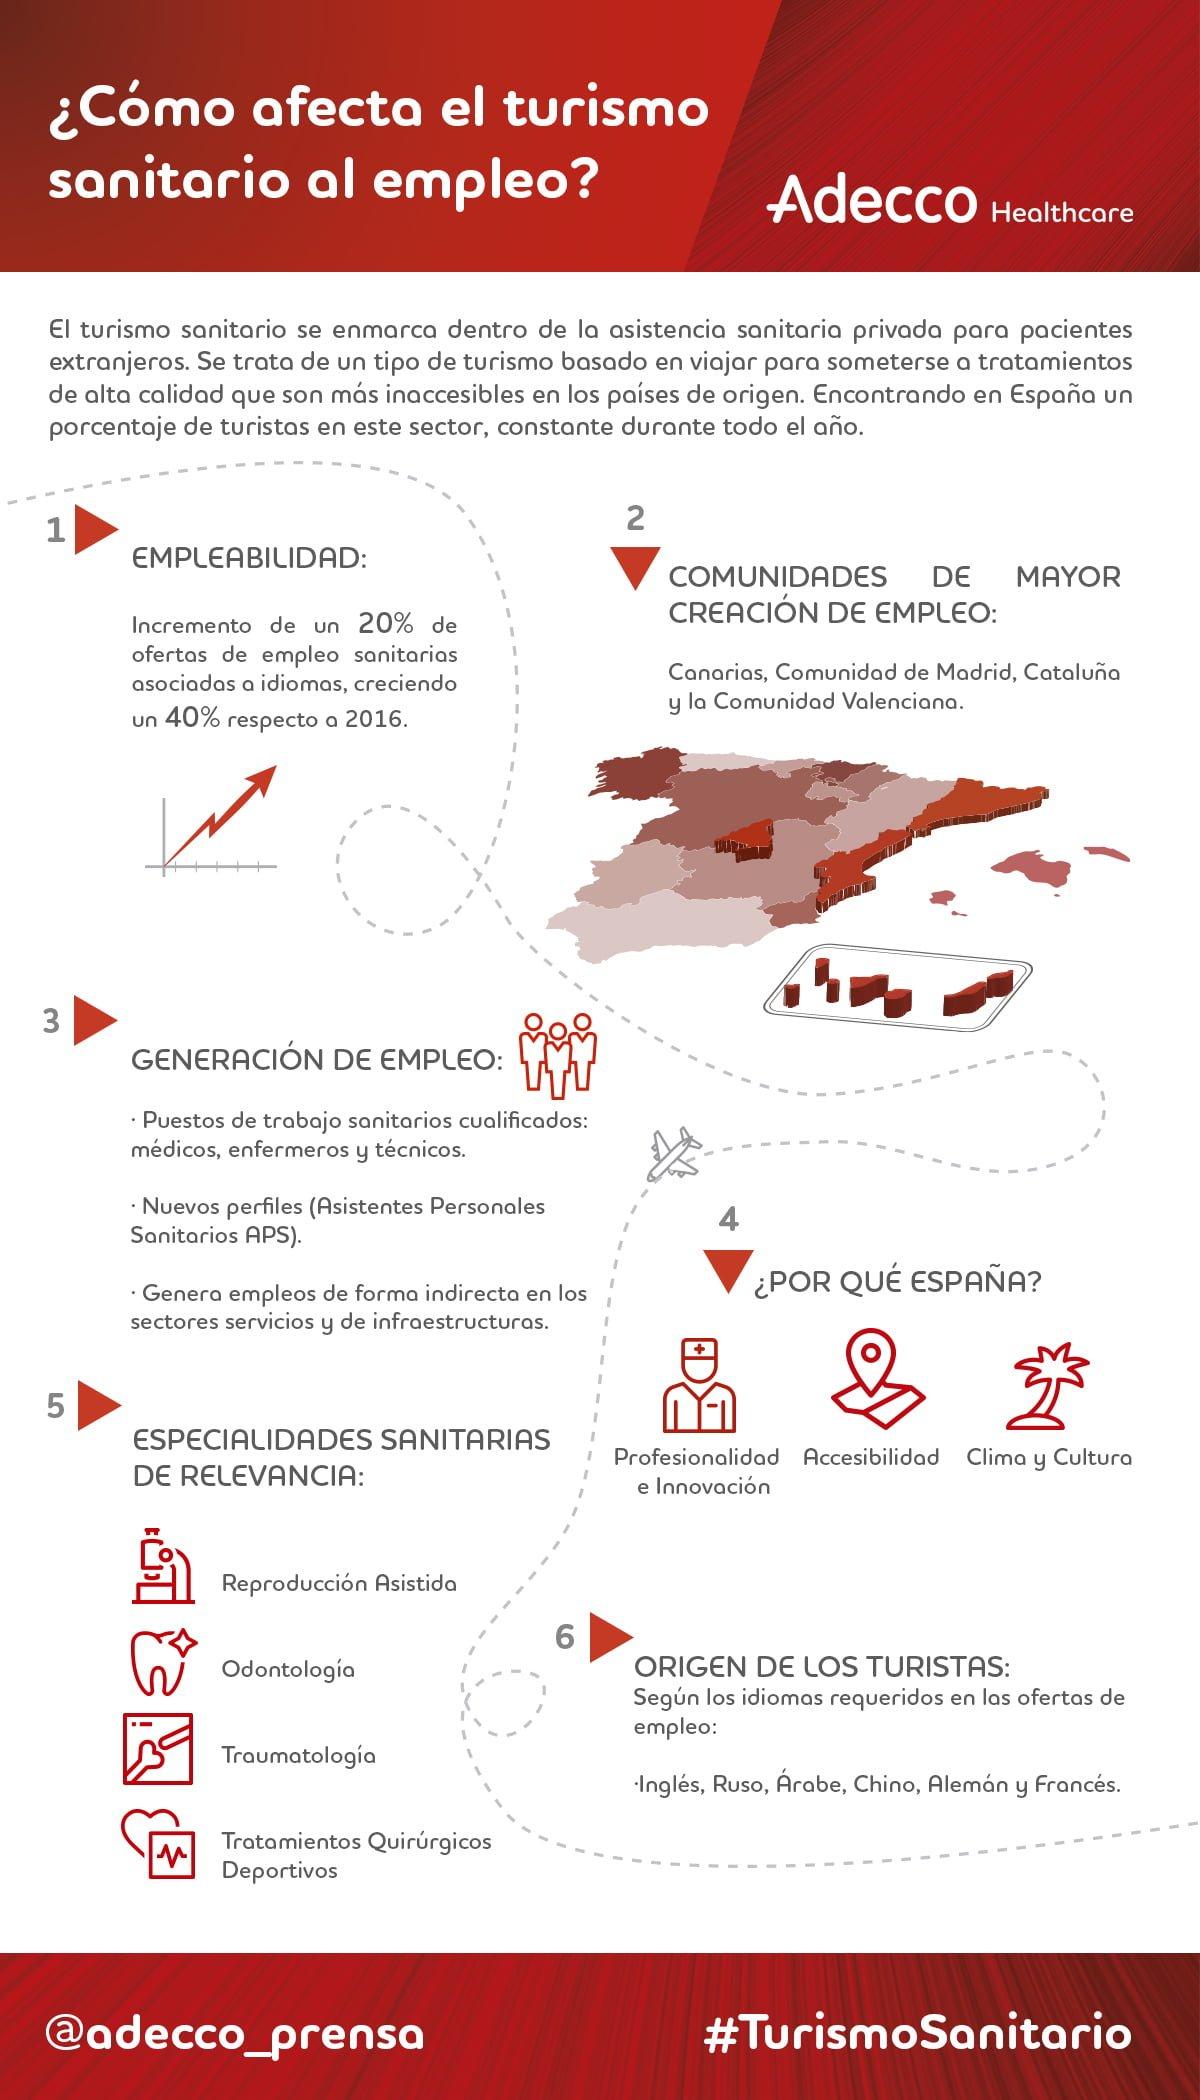 turismo-sanitario-adecco-healthcare